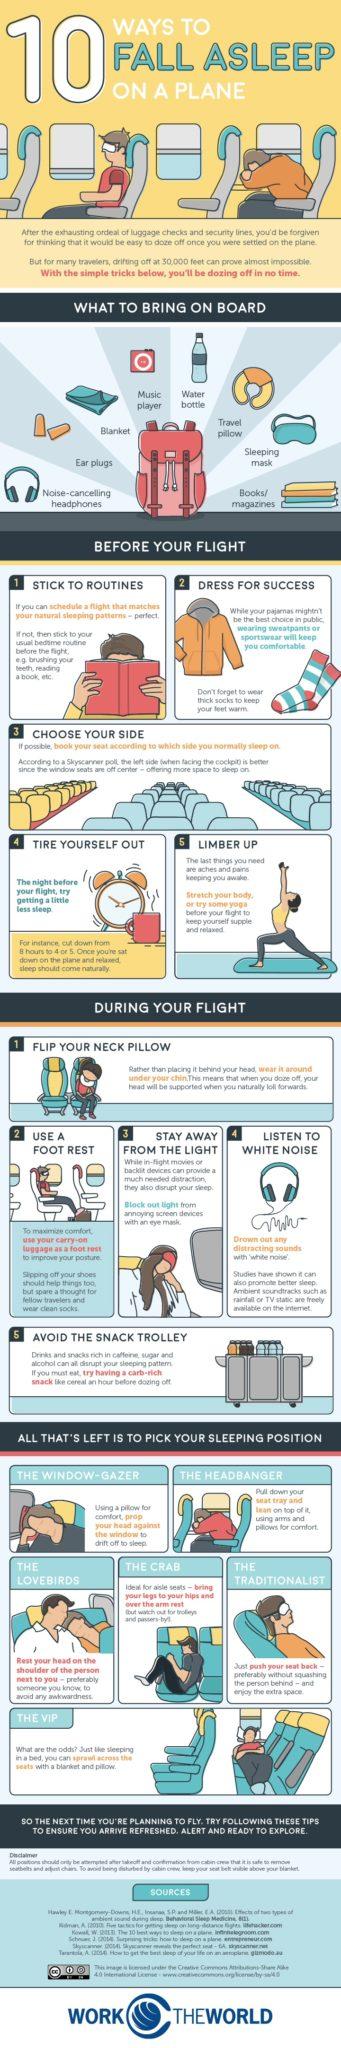 10 Ways to sleep better on the airplane